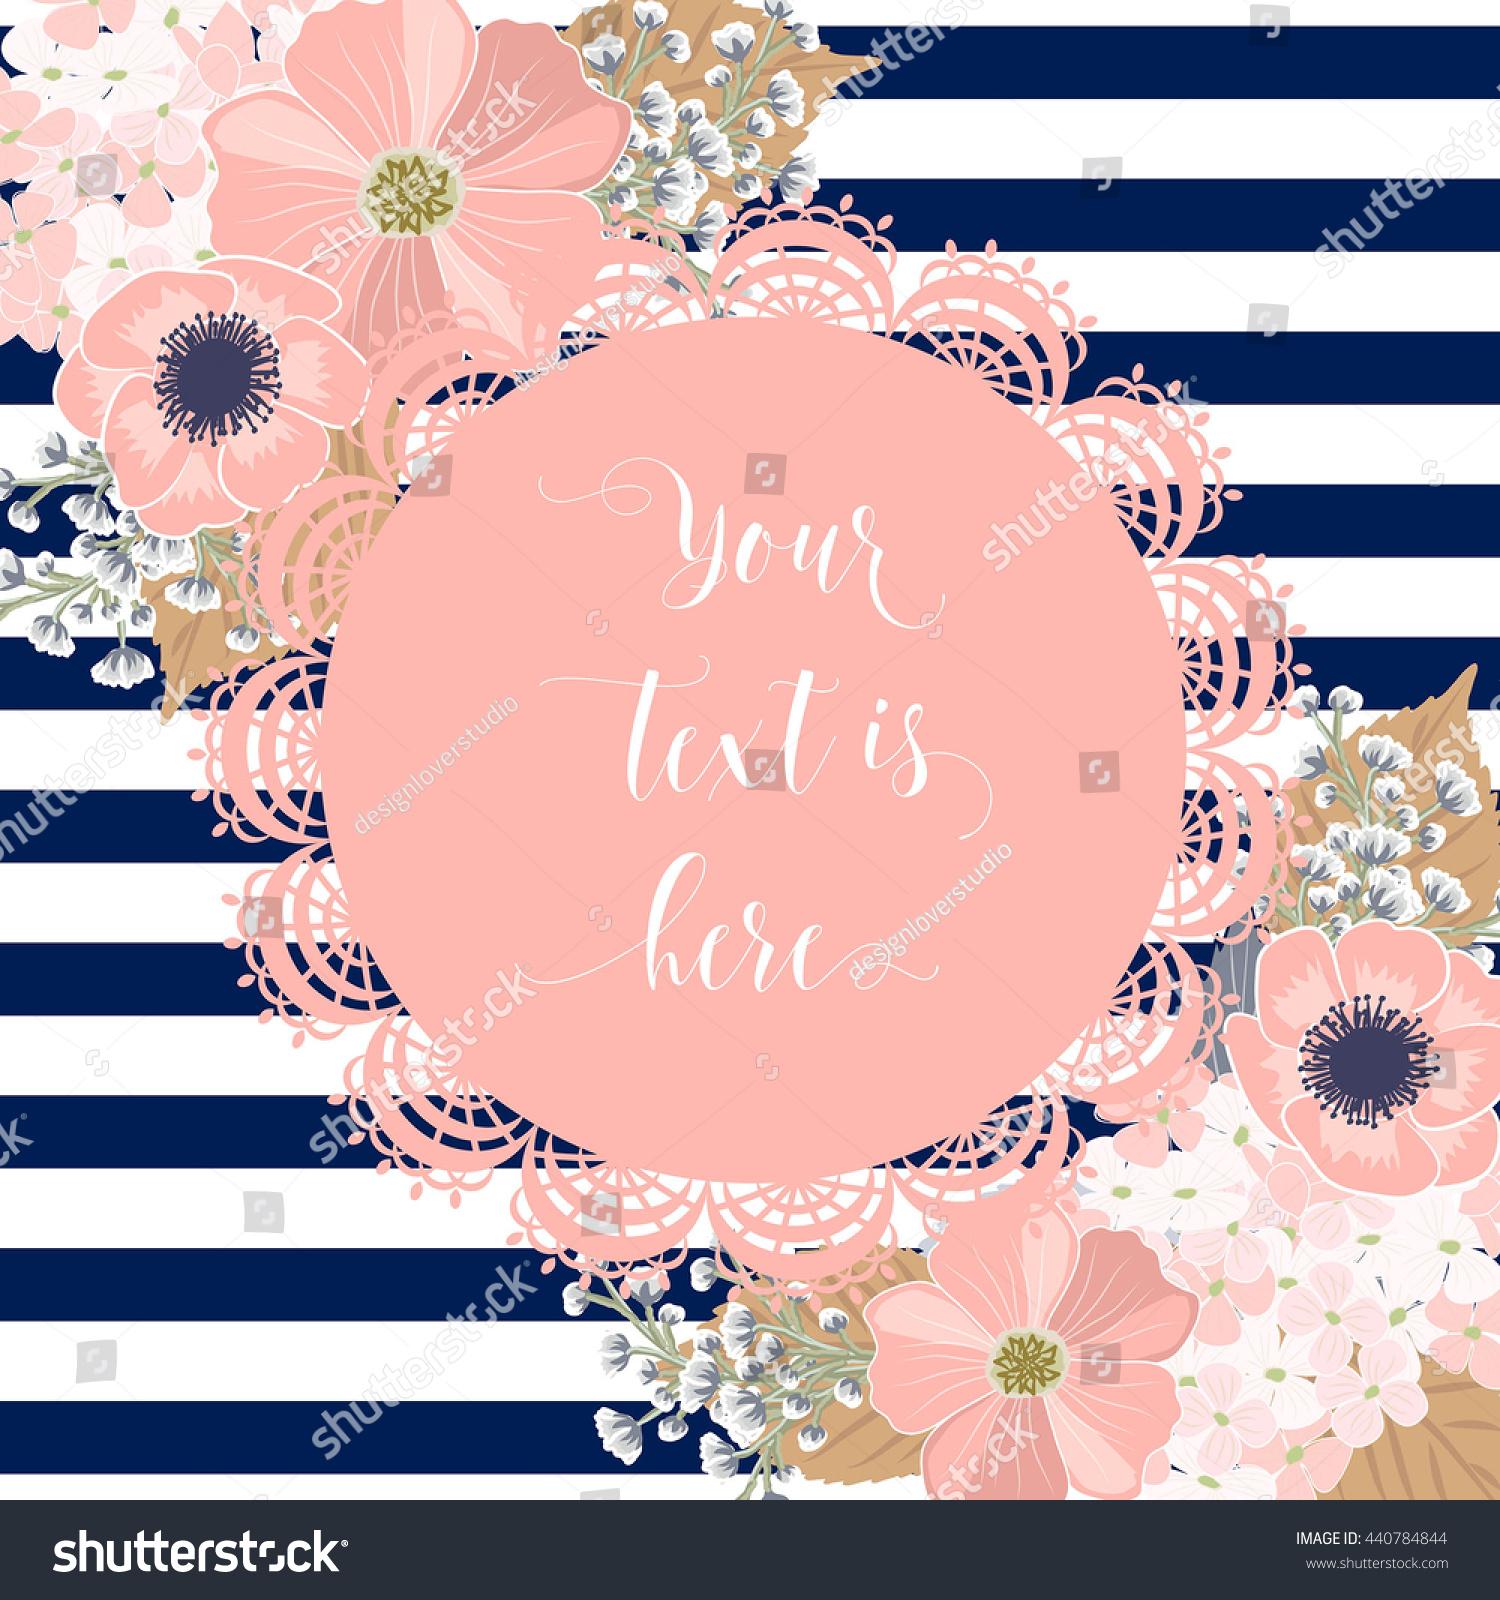 Navy Blue Peach Wedding Flower Stock Vector (Royalty Free) 440784844 ...